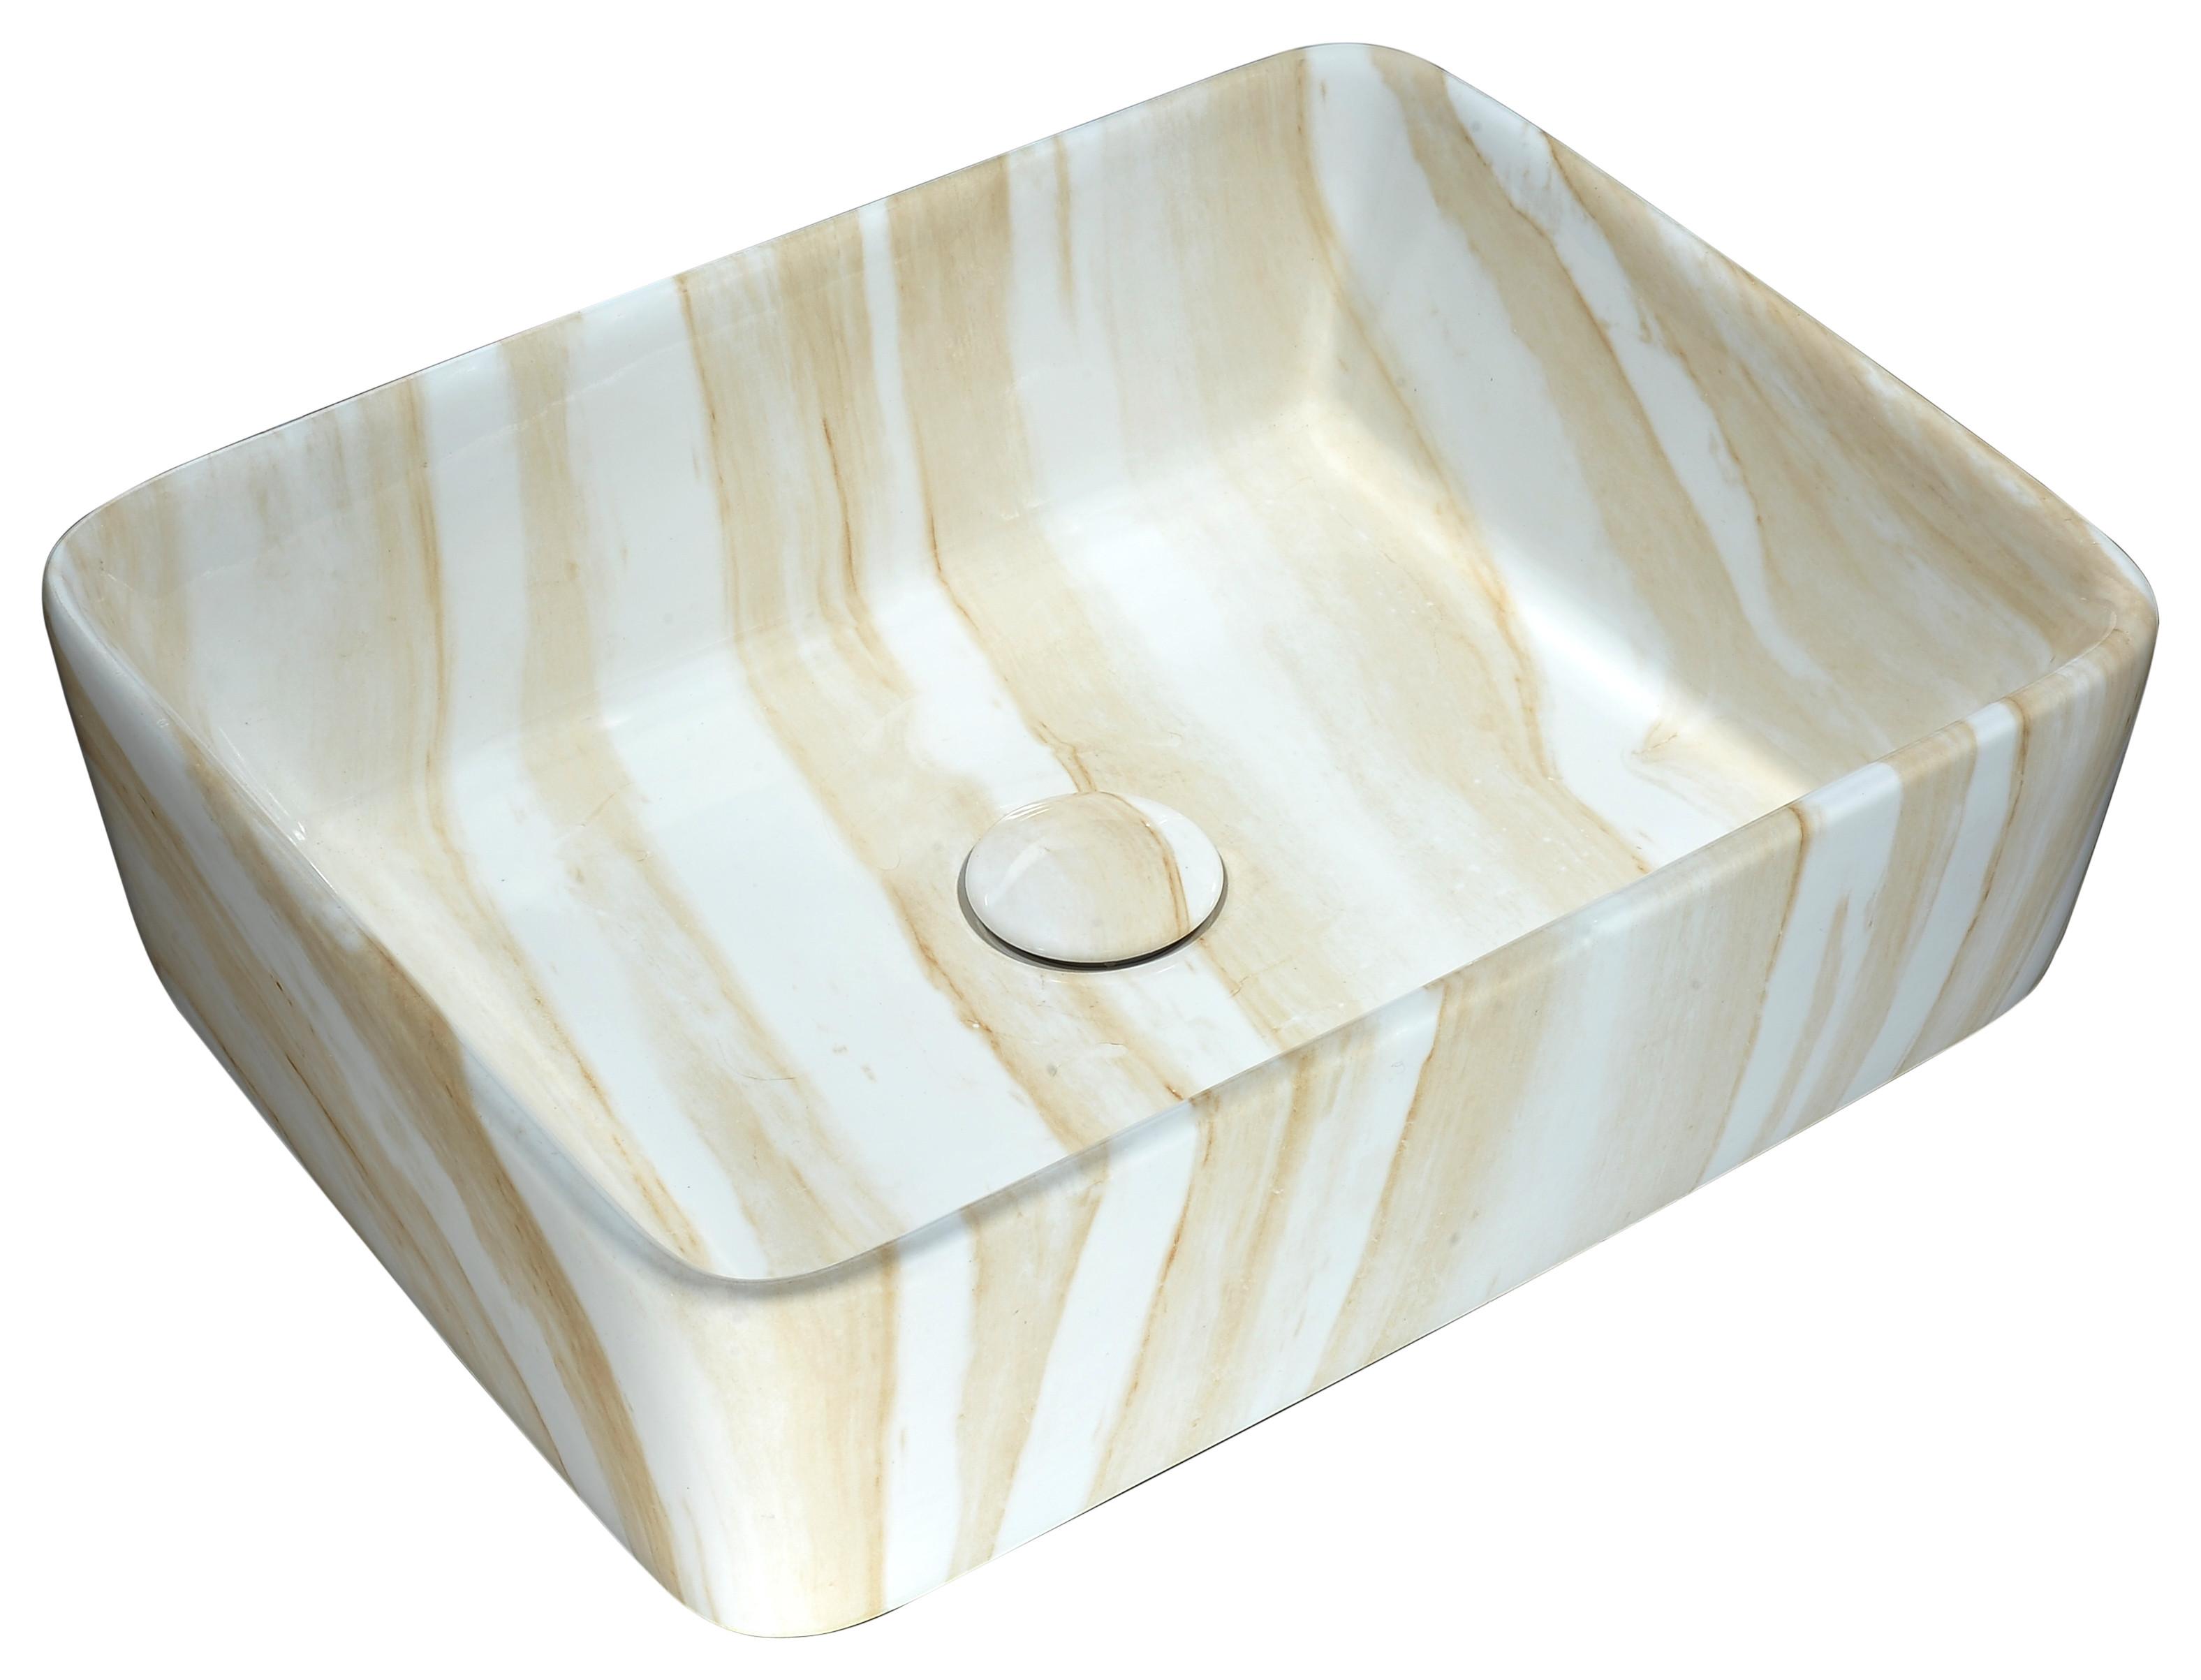 ANZZI LS-AZ243 Marbled Series Ceramic Vessel Sink In Marbled Cream Finish